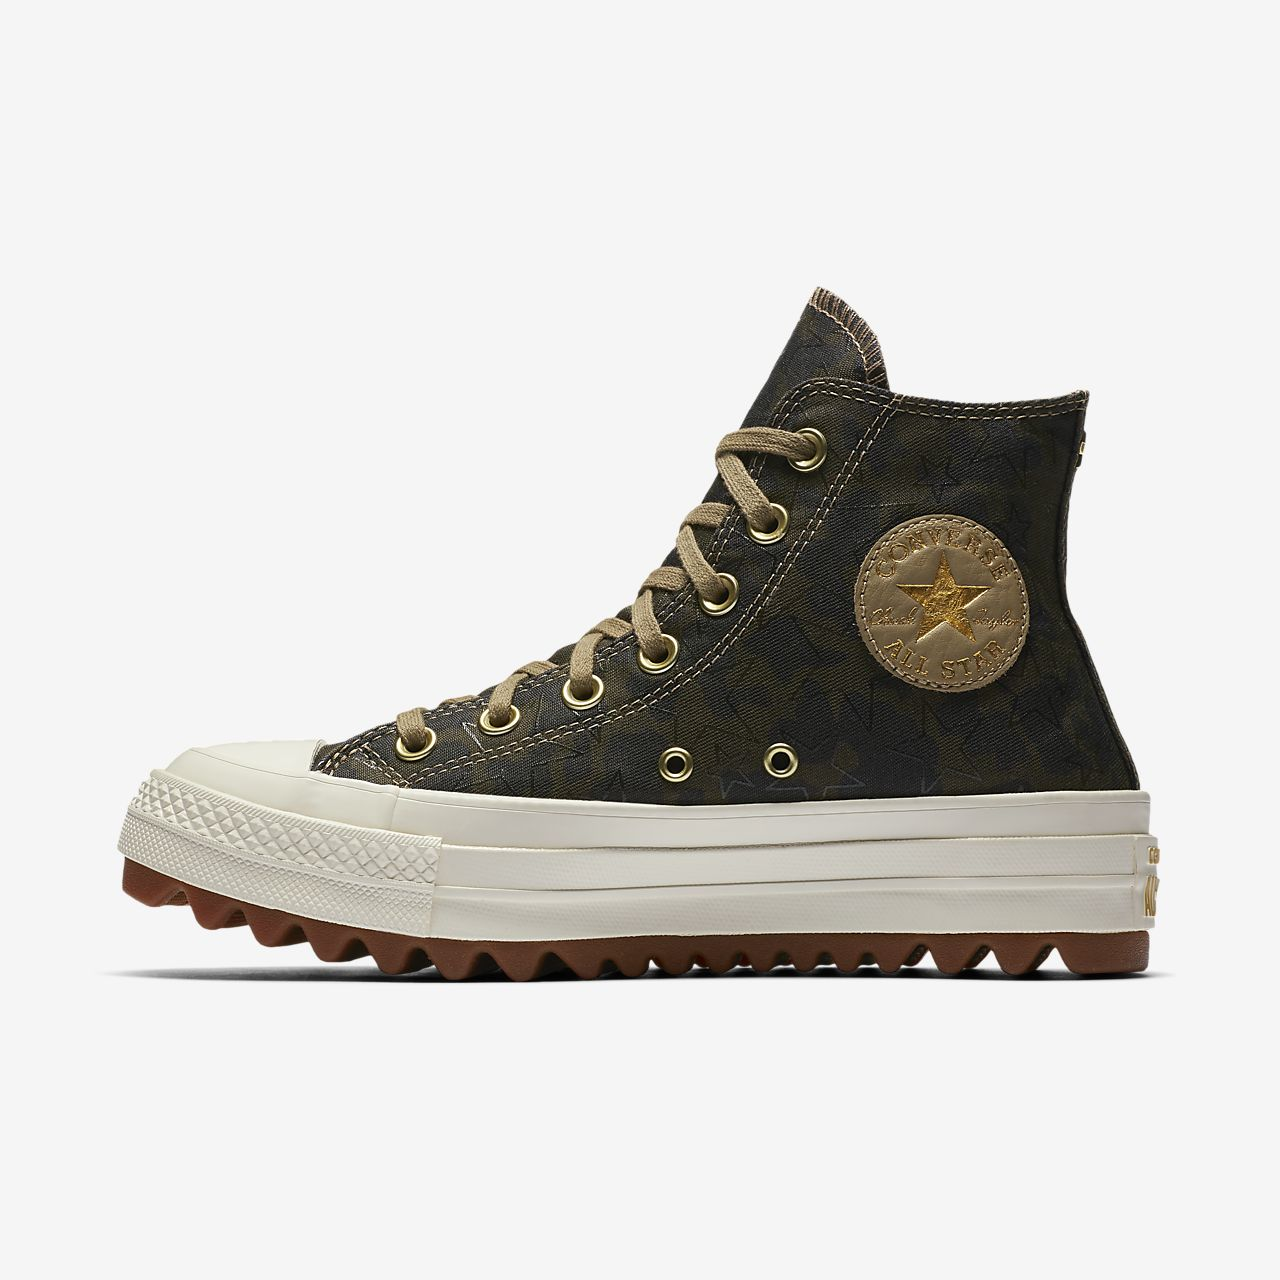 c3af4ddf5c75 Converse Chuck Taylor All Star Lift Ripple Camo High Top Women s Shoe